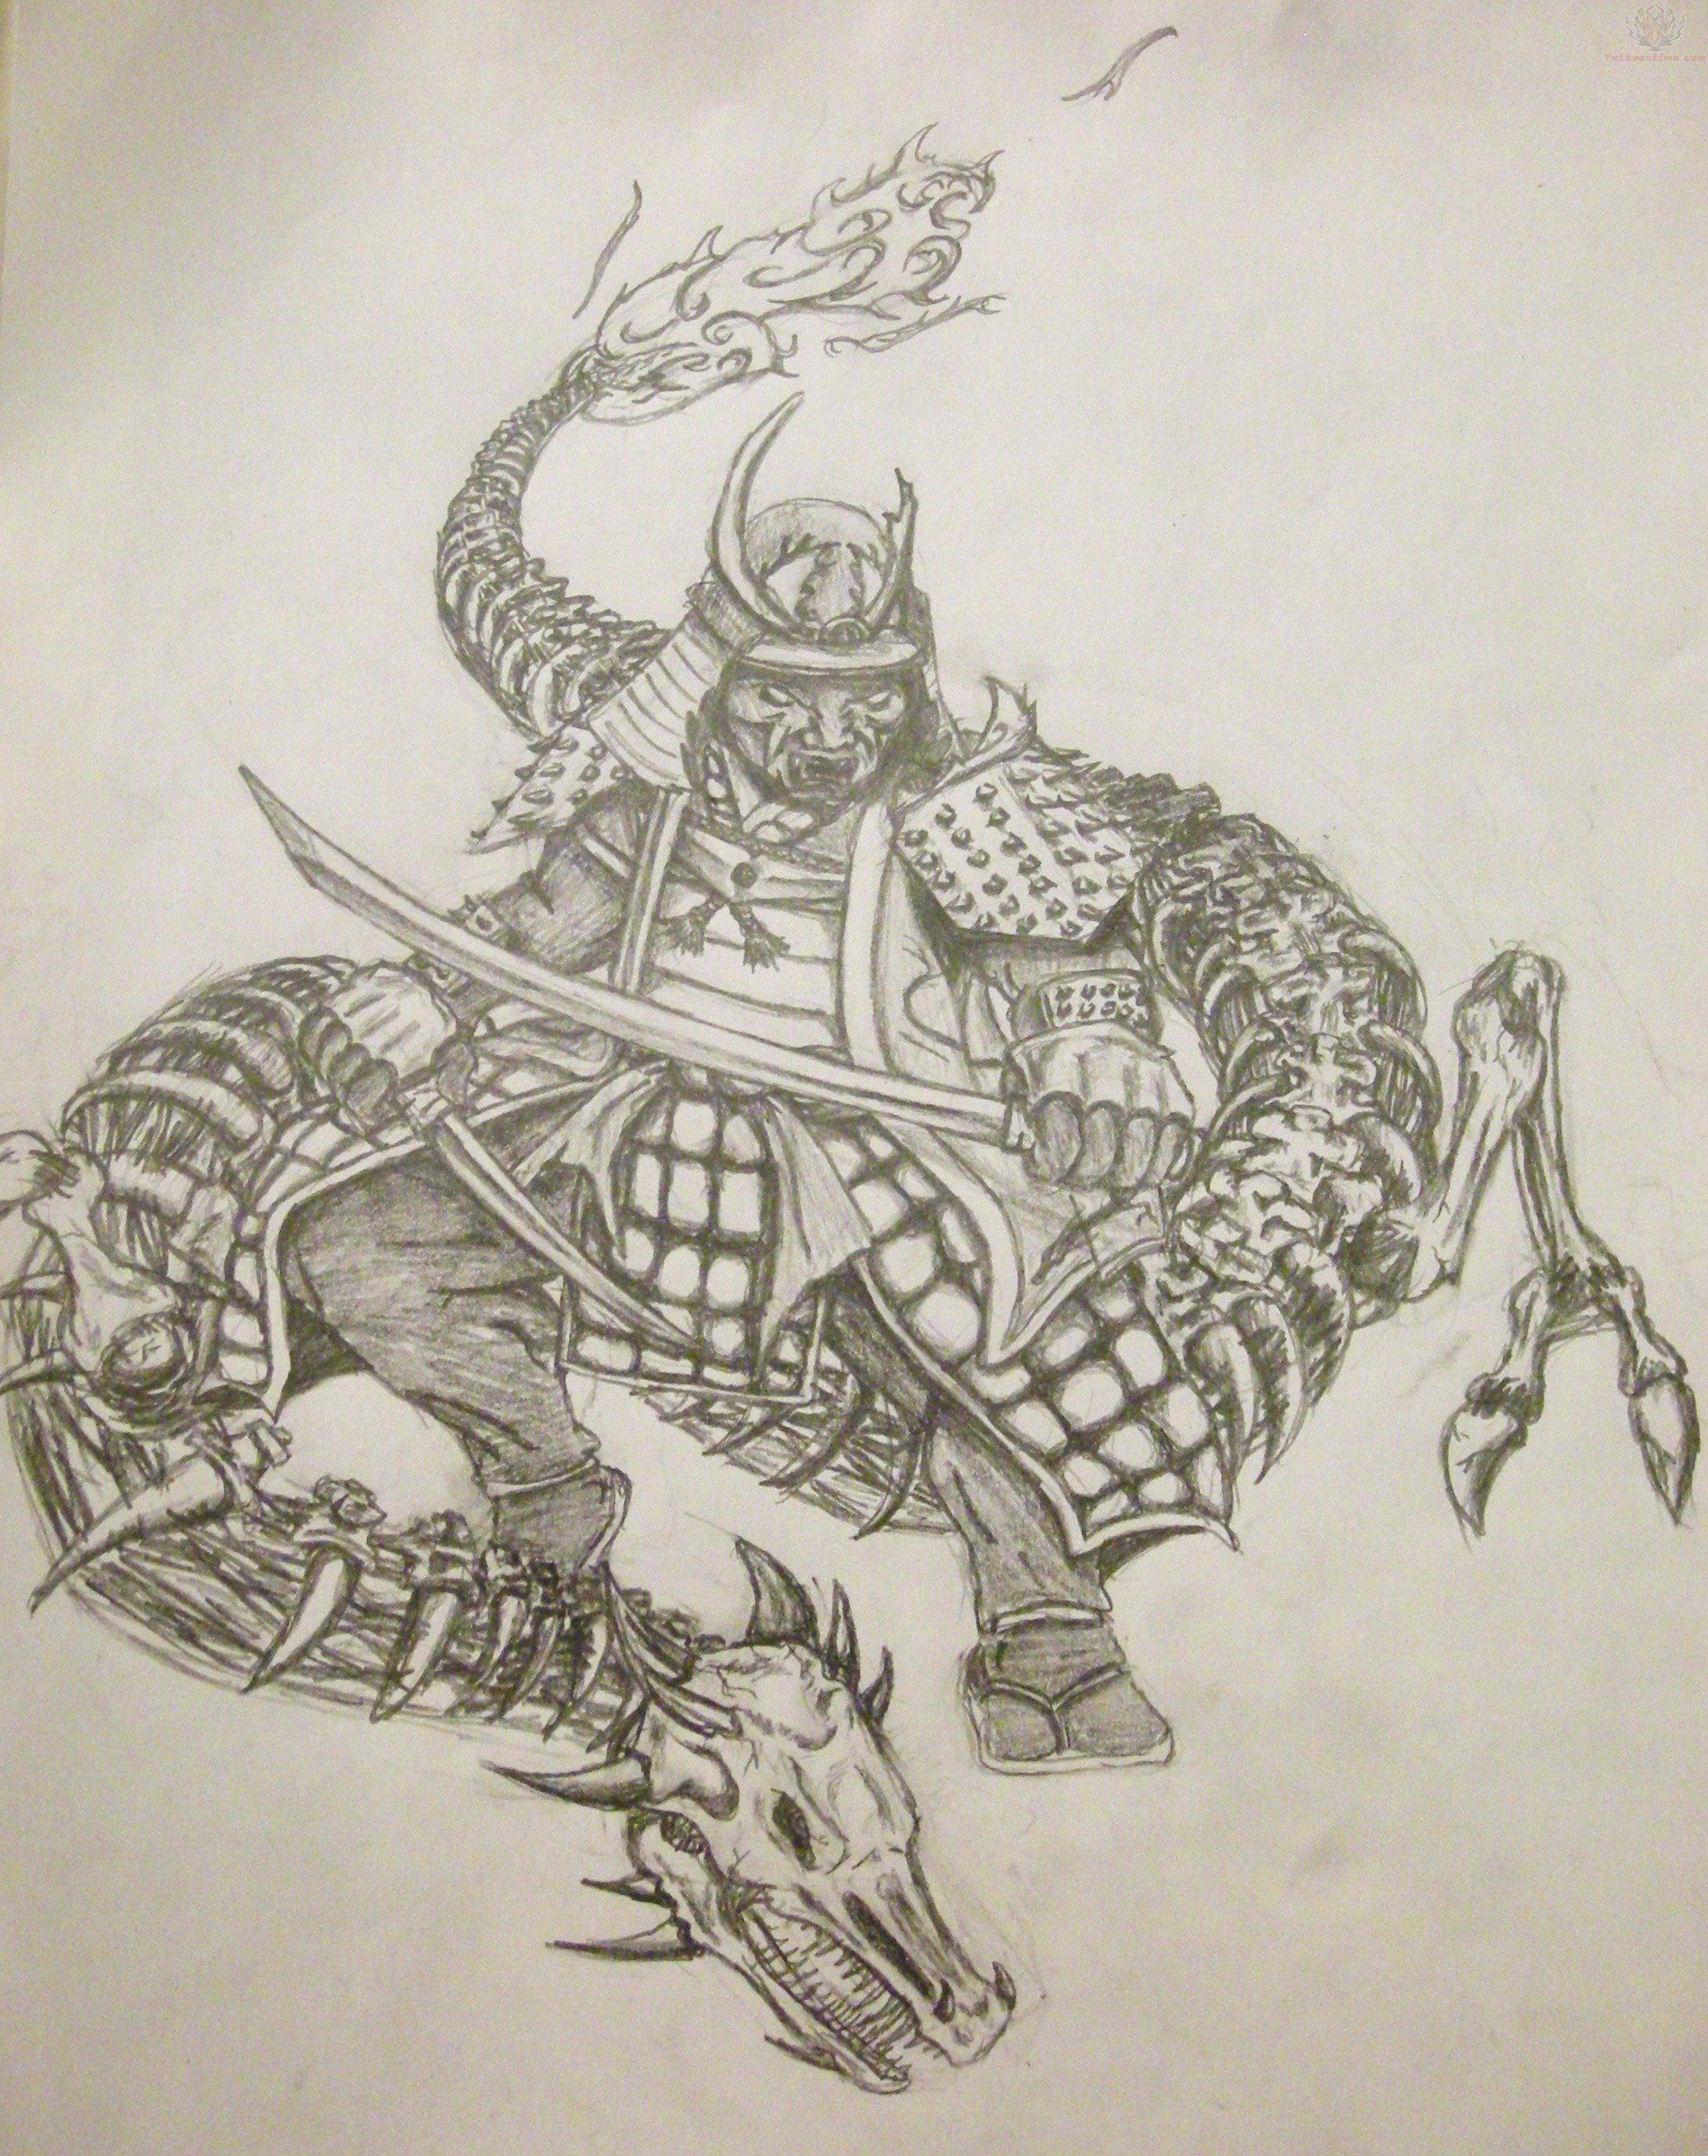 Samurai mask tattoo meaning design site genuardis portal for Dragon and samurai tattoo meaning